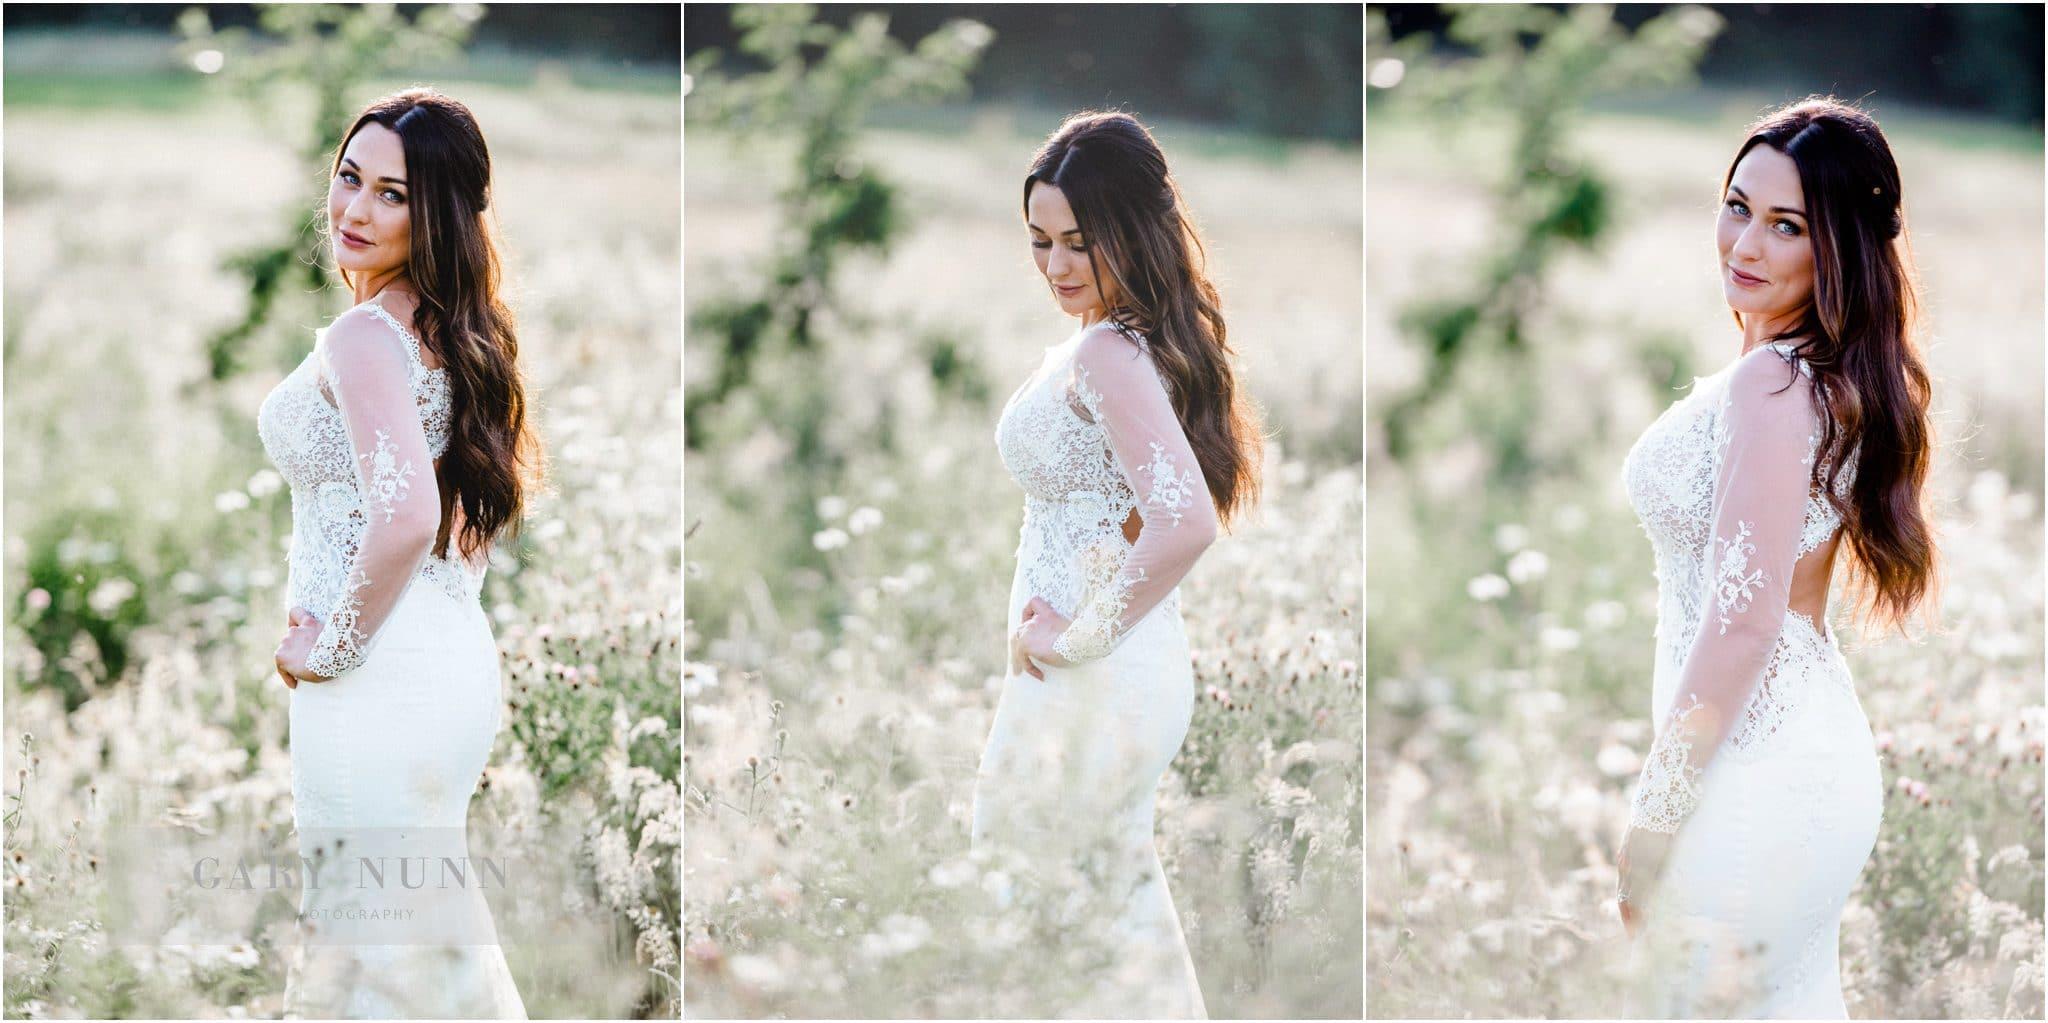 Elmore Court, brides pose, beautiful bride, elmore court weddings, Destination Wedding Photographer, wedding photographer Milton Keynes, Elmore Court